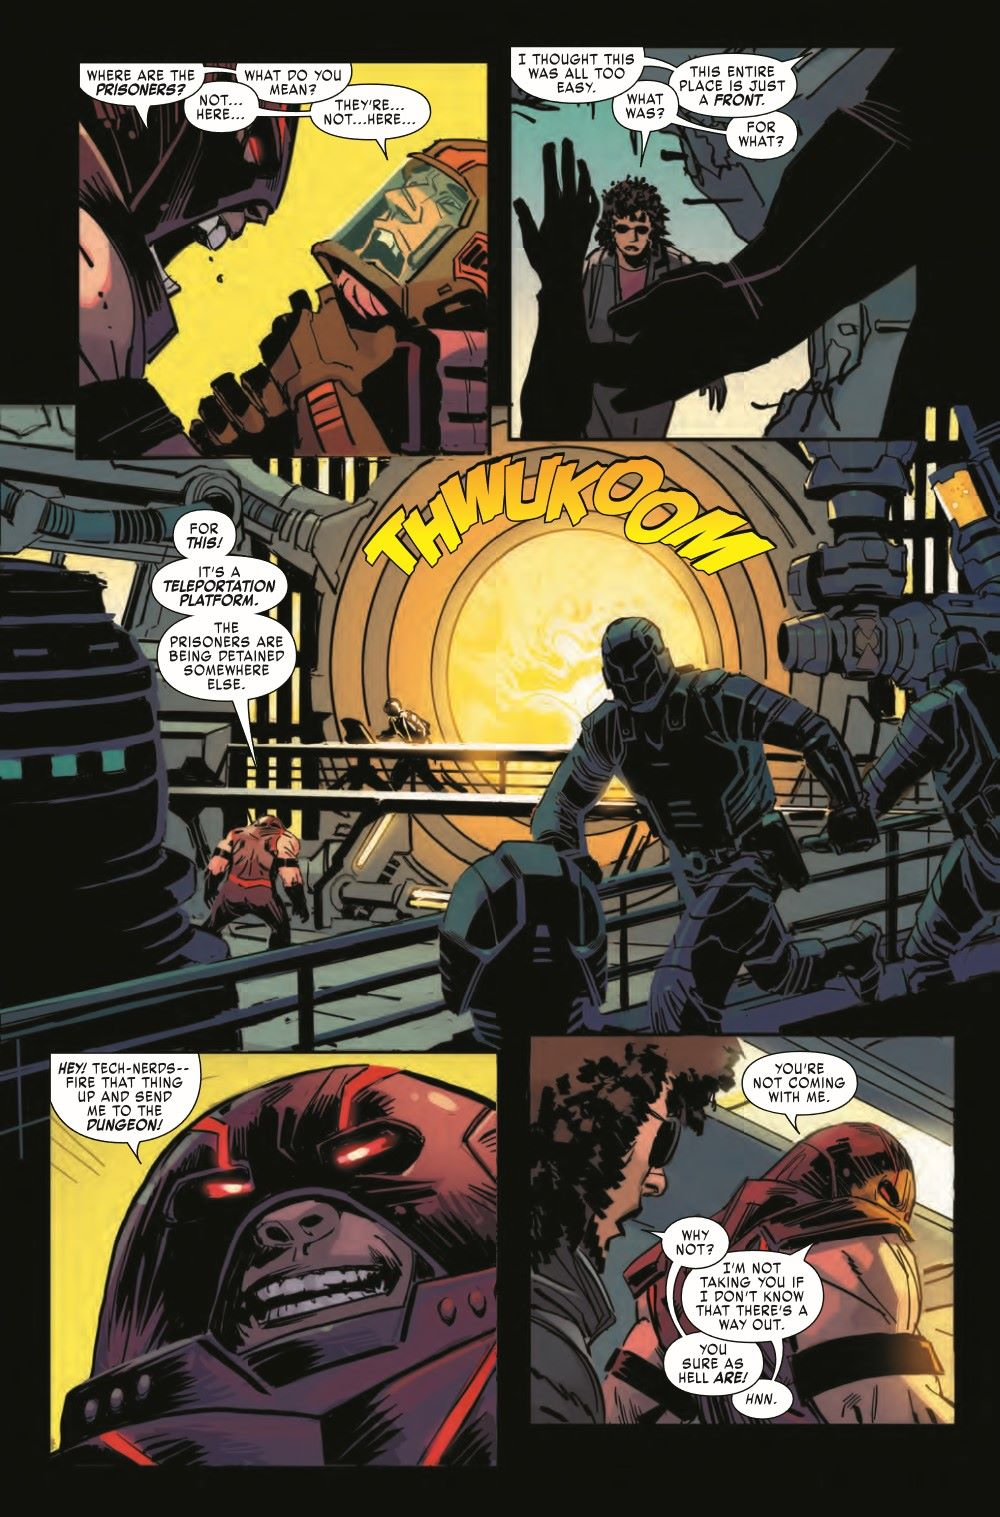 JUGG2020005_Preview-6 ComicList Previews: JUGGERNAUT #5 (OF 5)